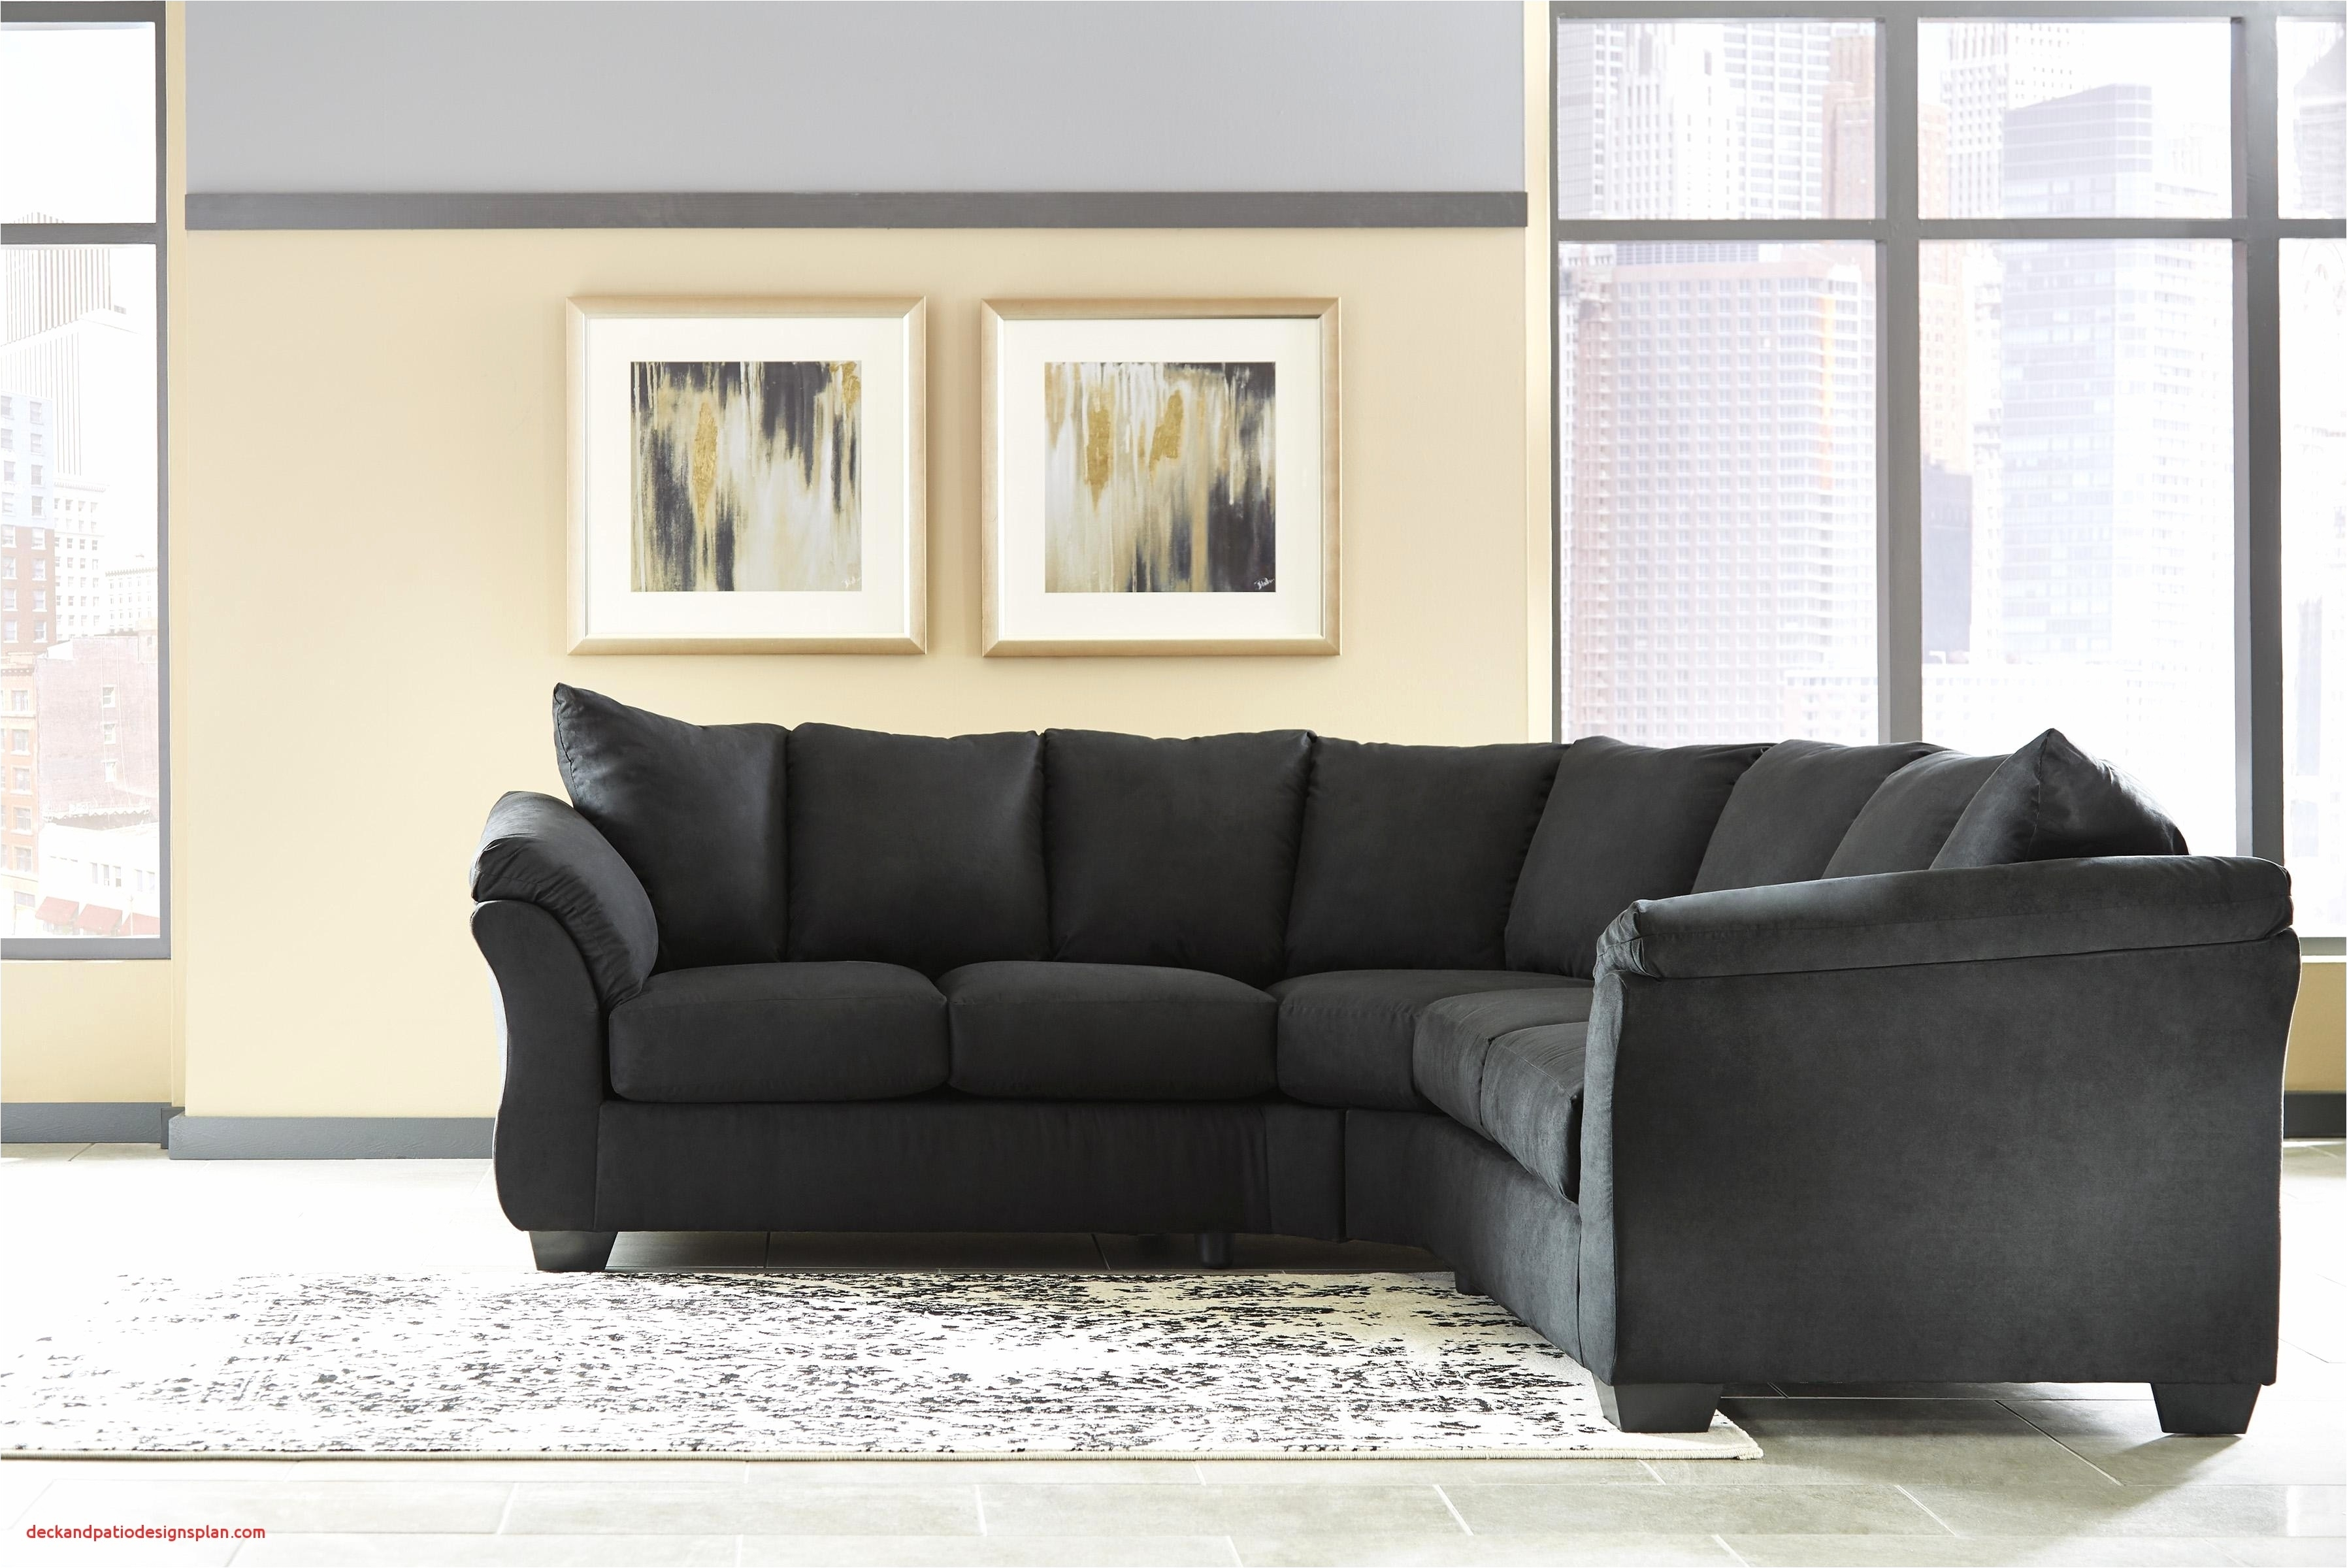 macys leather chair recliner sofa chairs inspirational gunstiges big gunstige macys furniture 0d